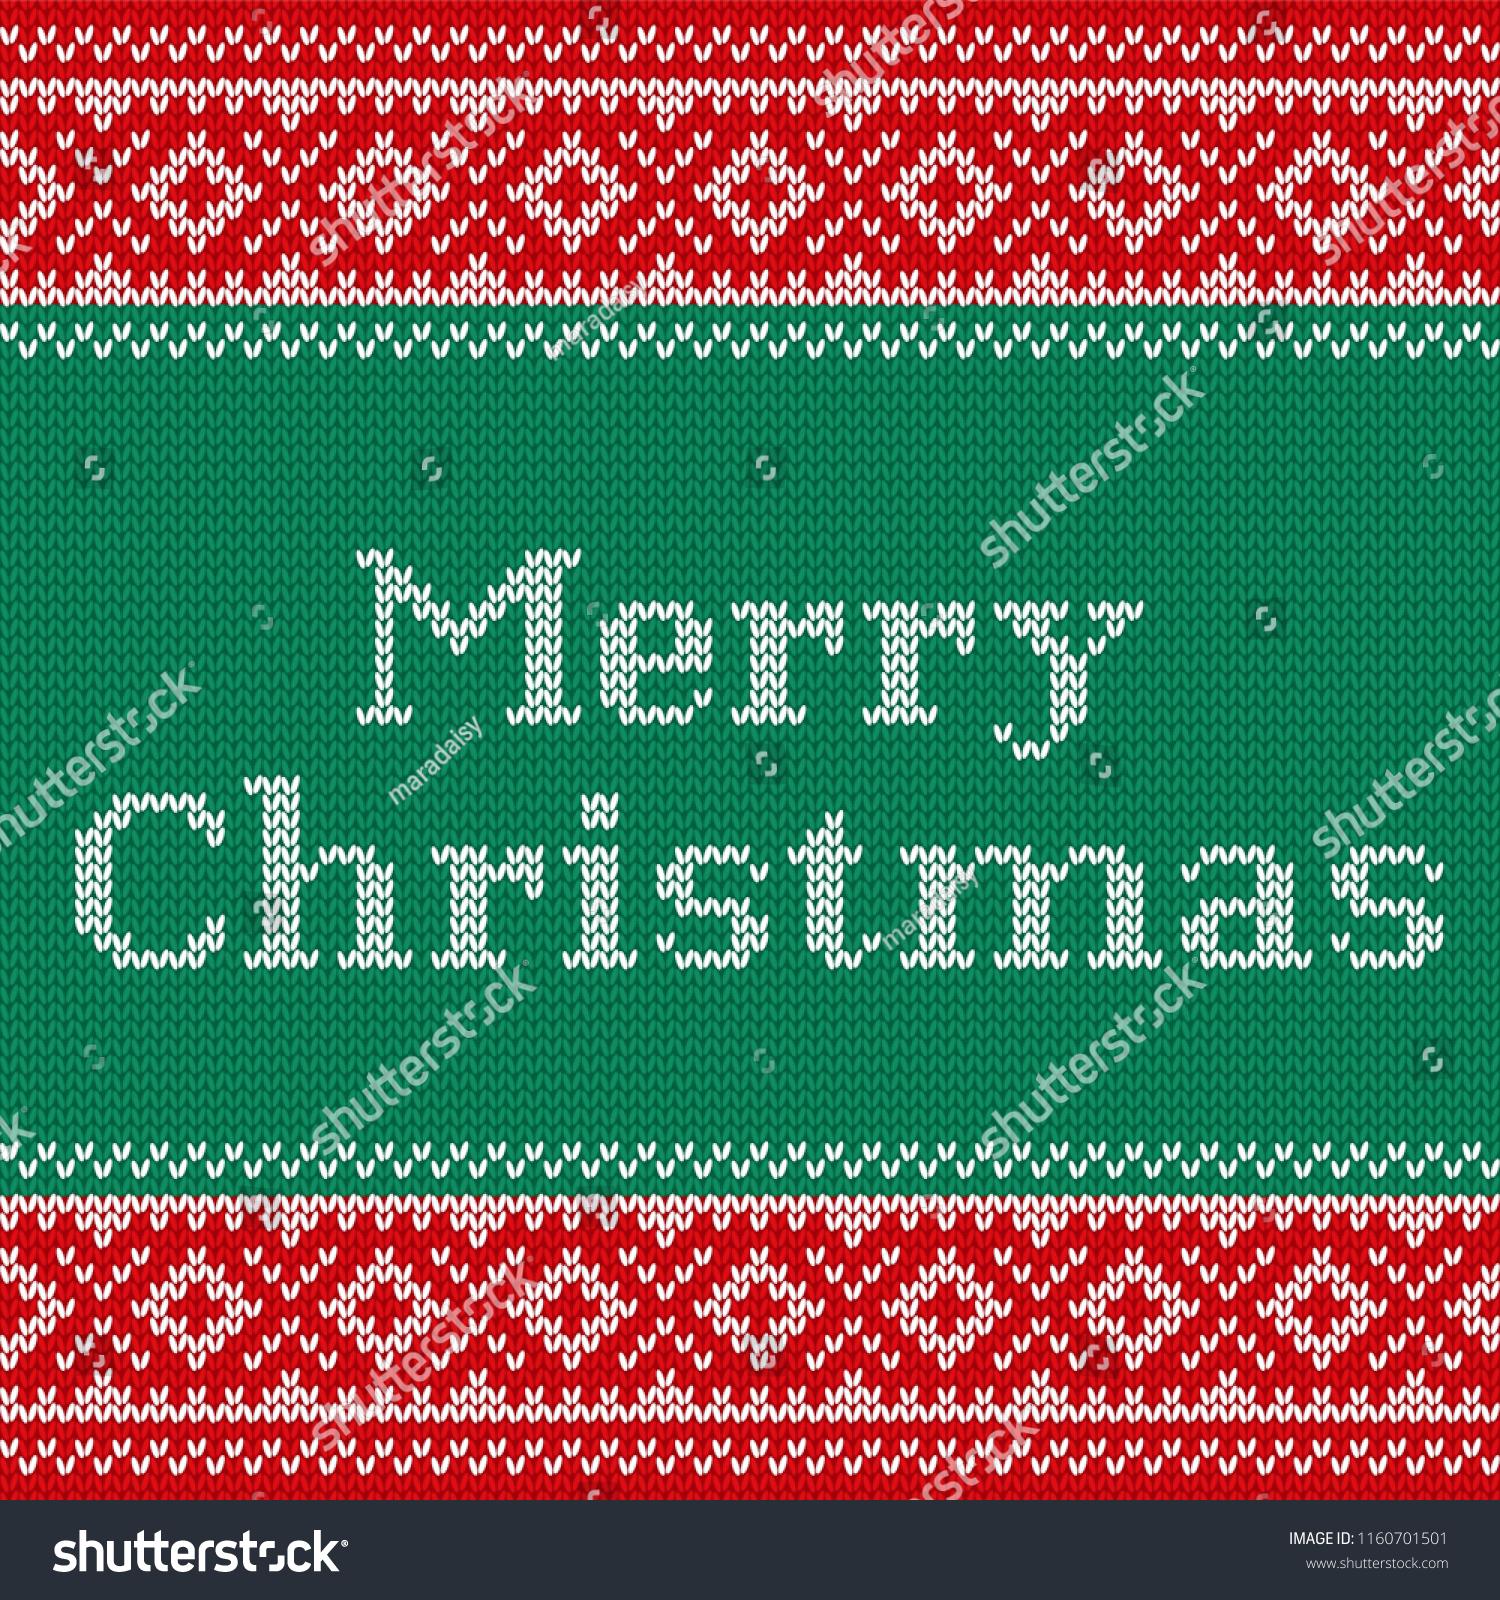 12d724a32 Christmas Knitting Pattern Knit Seamless Design Stock Vector ...